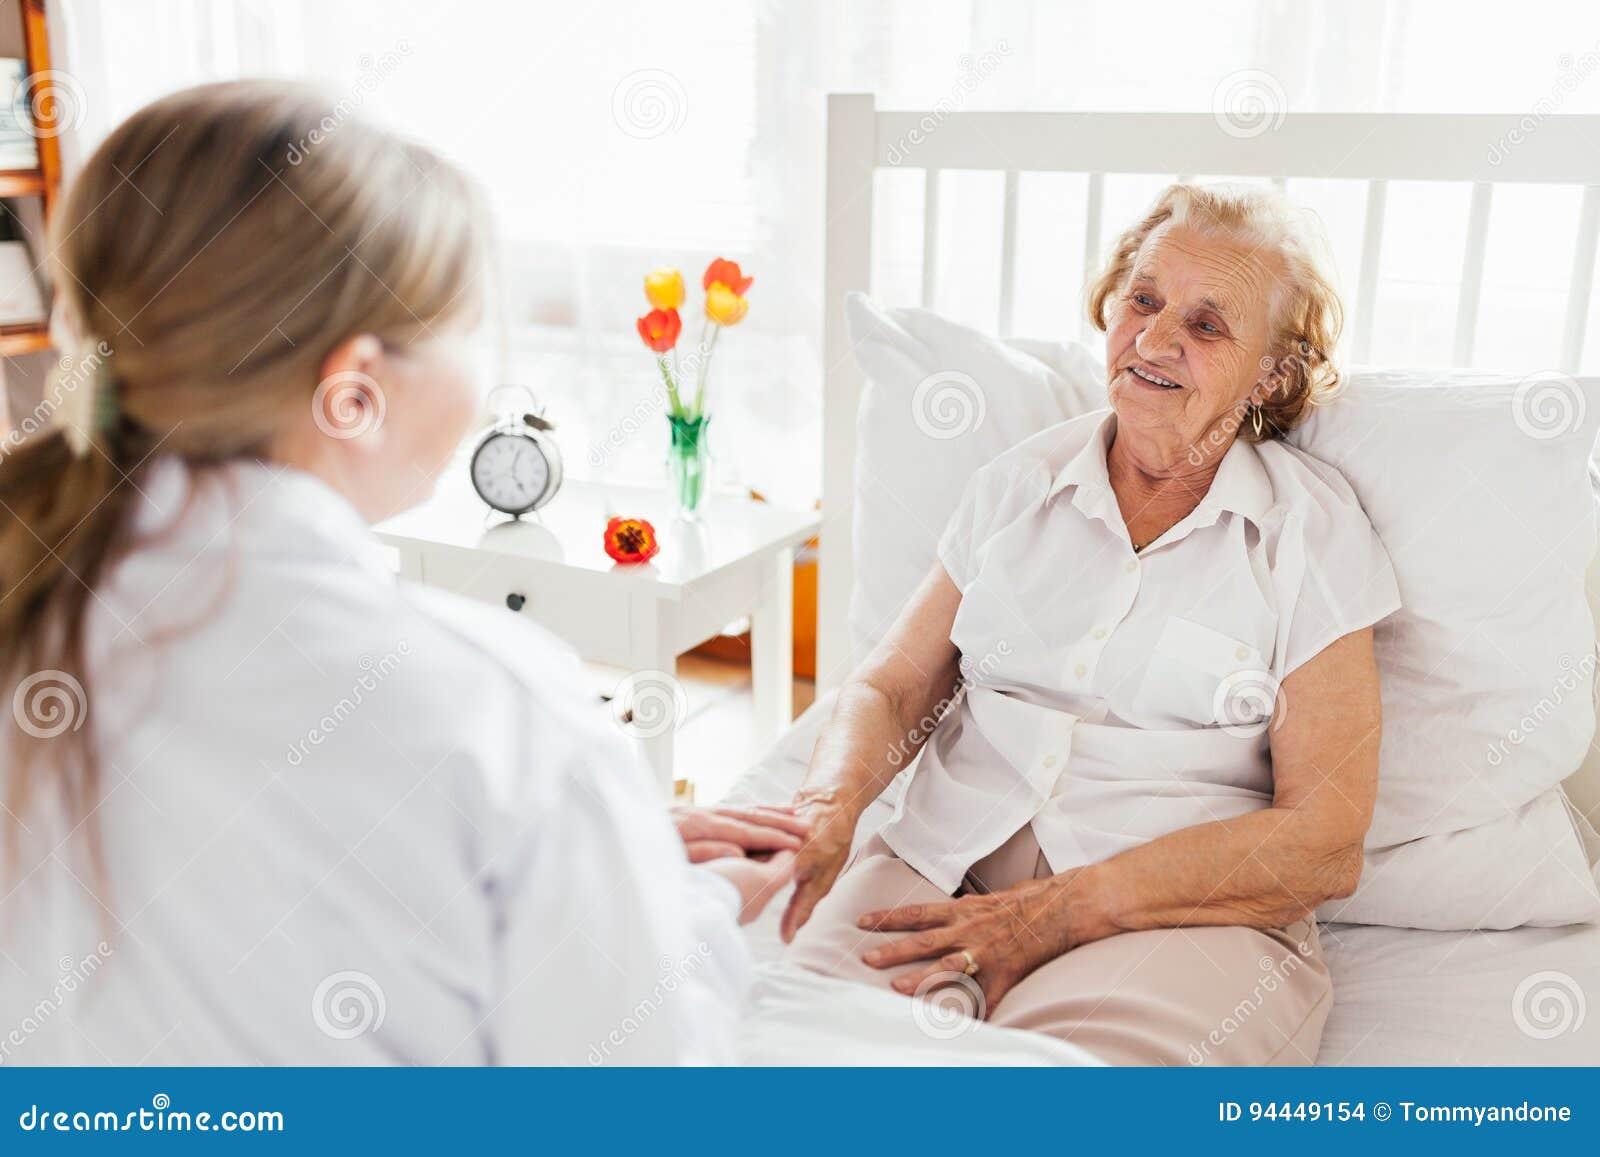 10 Charities for Elderly People